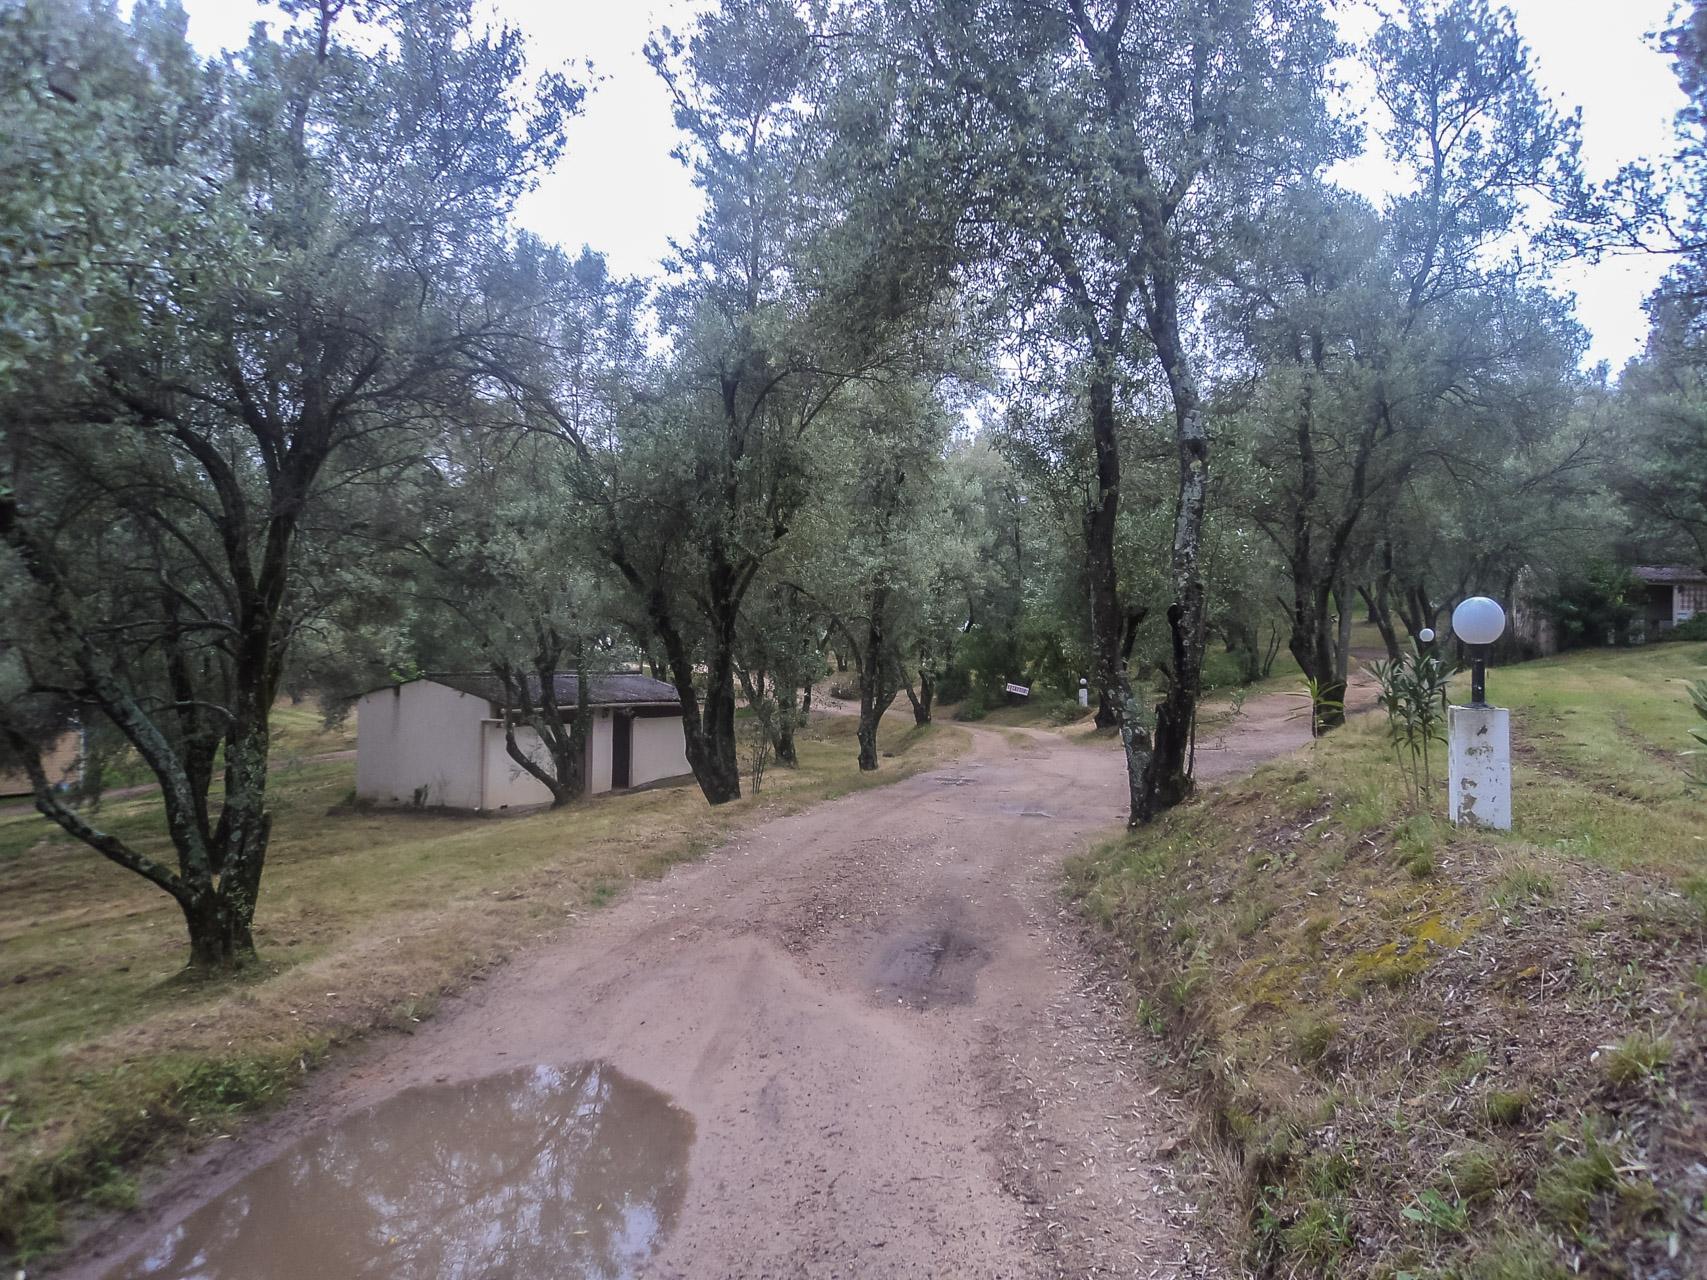 Camping La Sposata